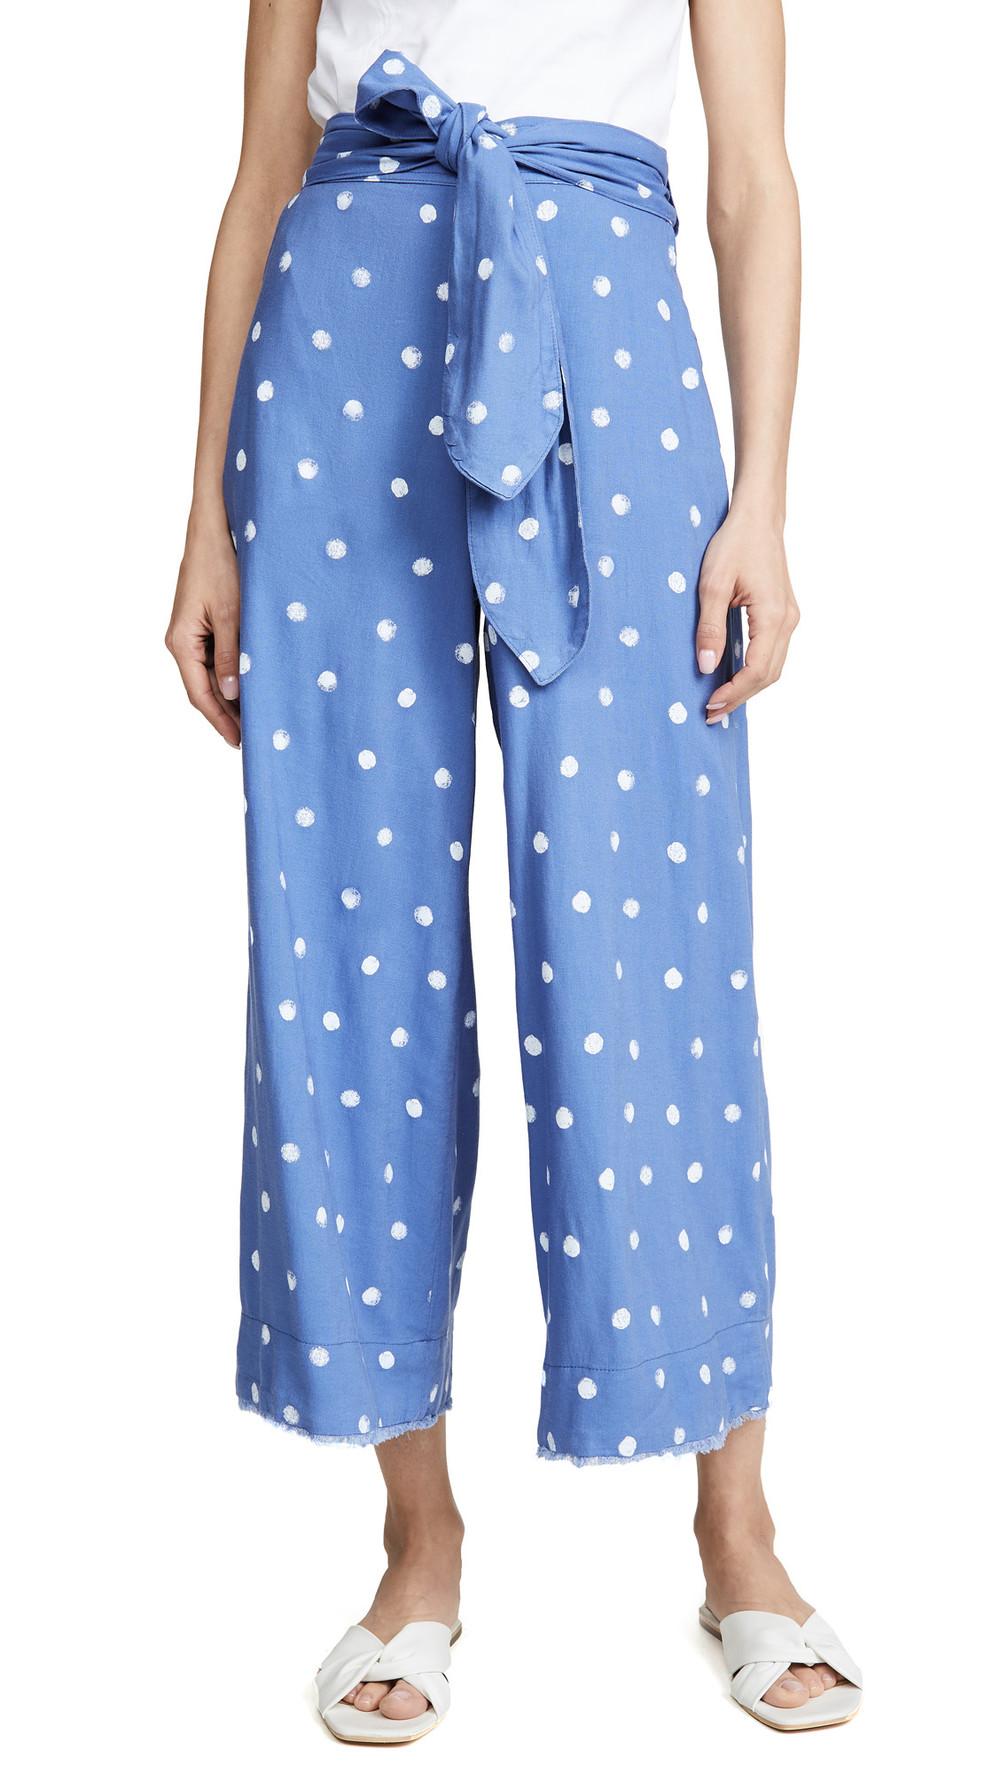 Bella Dahl Belted Crop Pants in blue